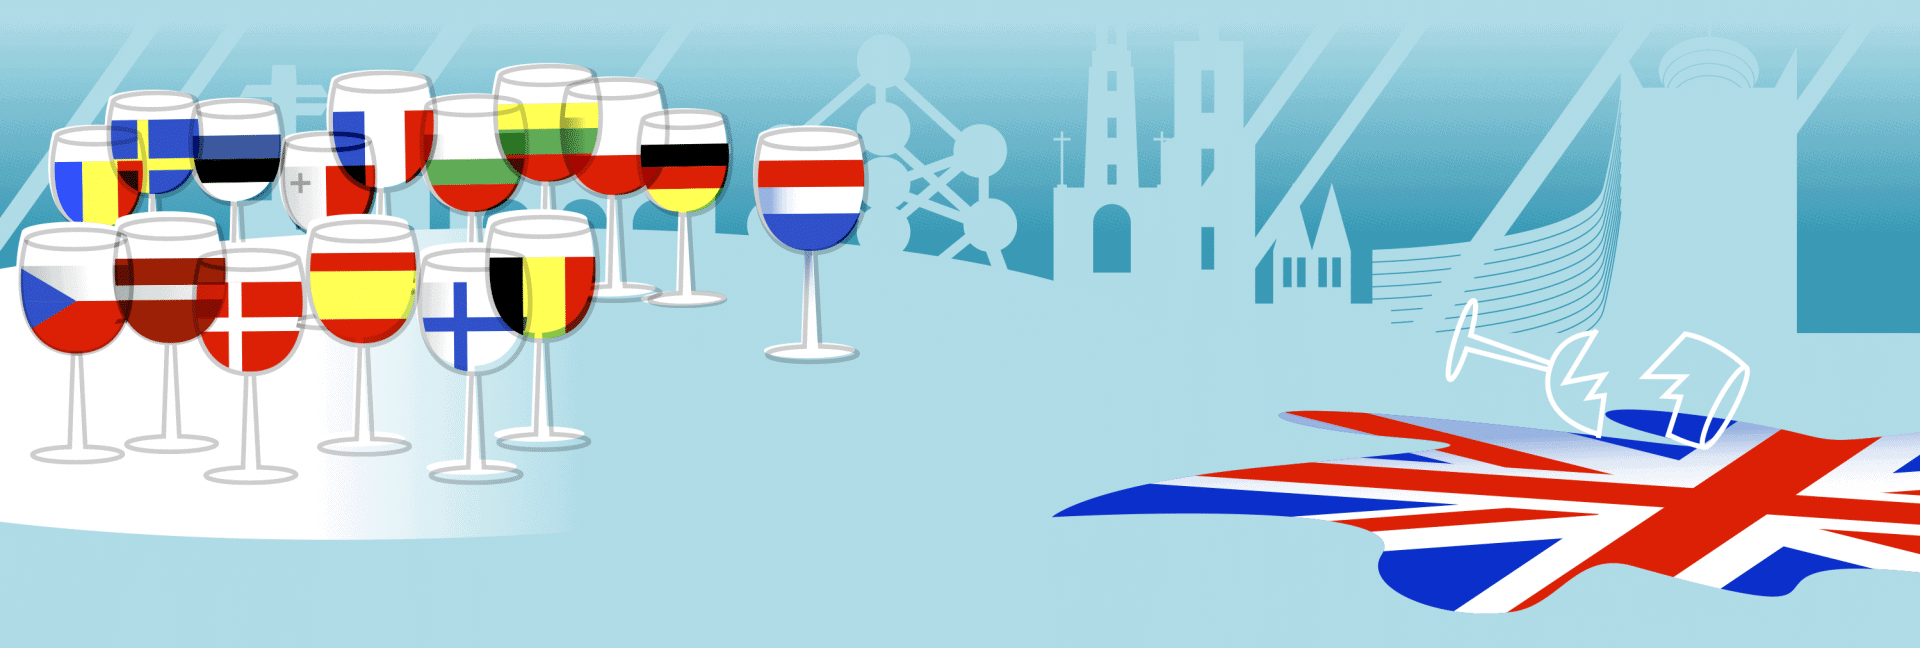 Europese unie trends